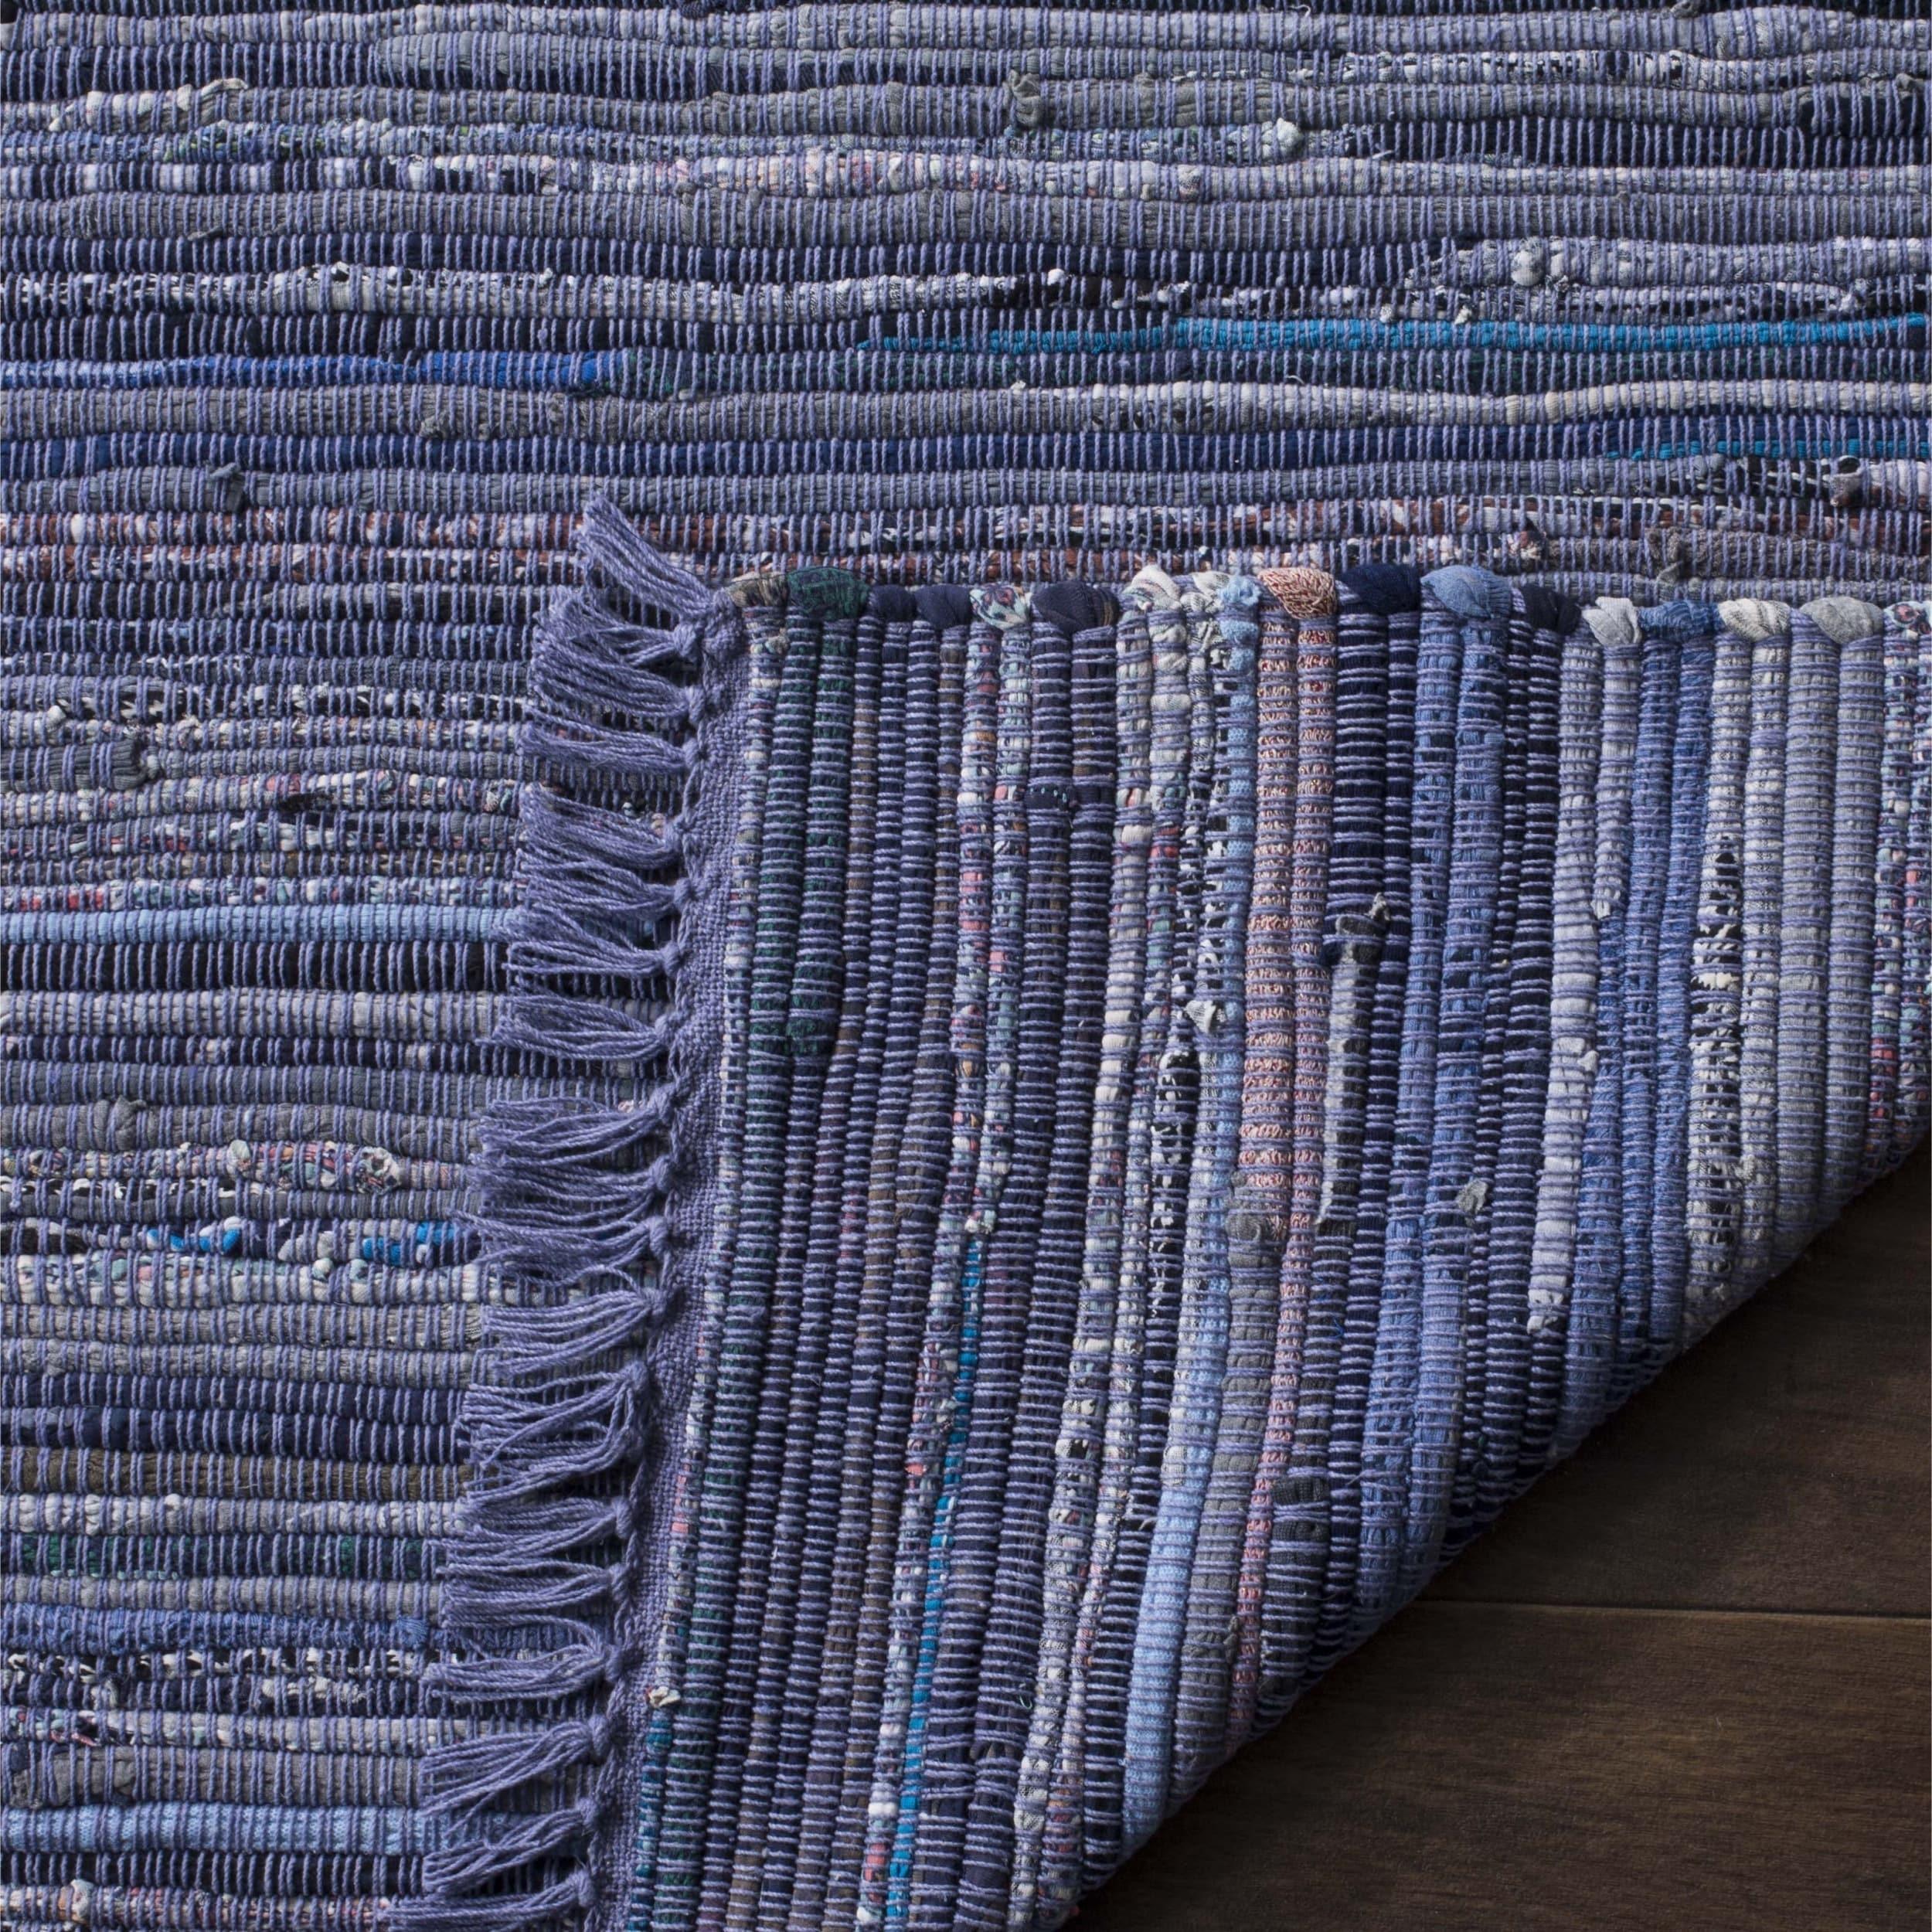 Safavieh Hand Woven Rag Rug Purple Cotton 8 X 10 Free Shipping Today 16240867